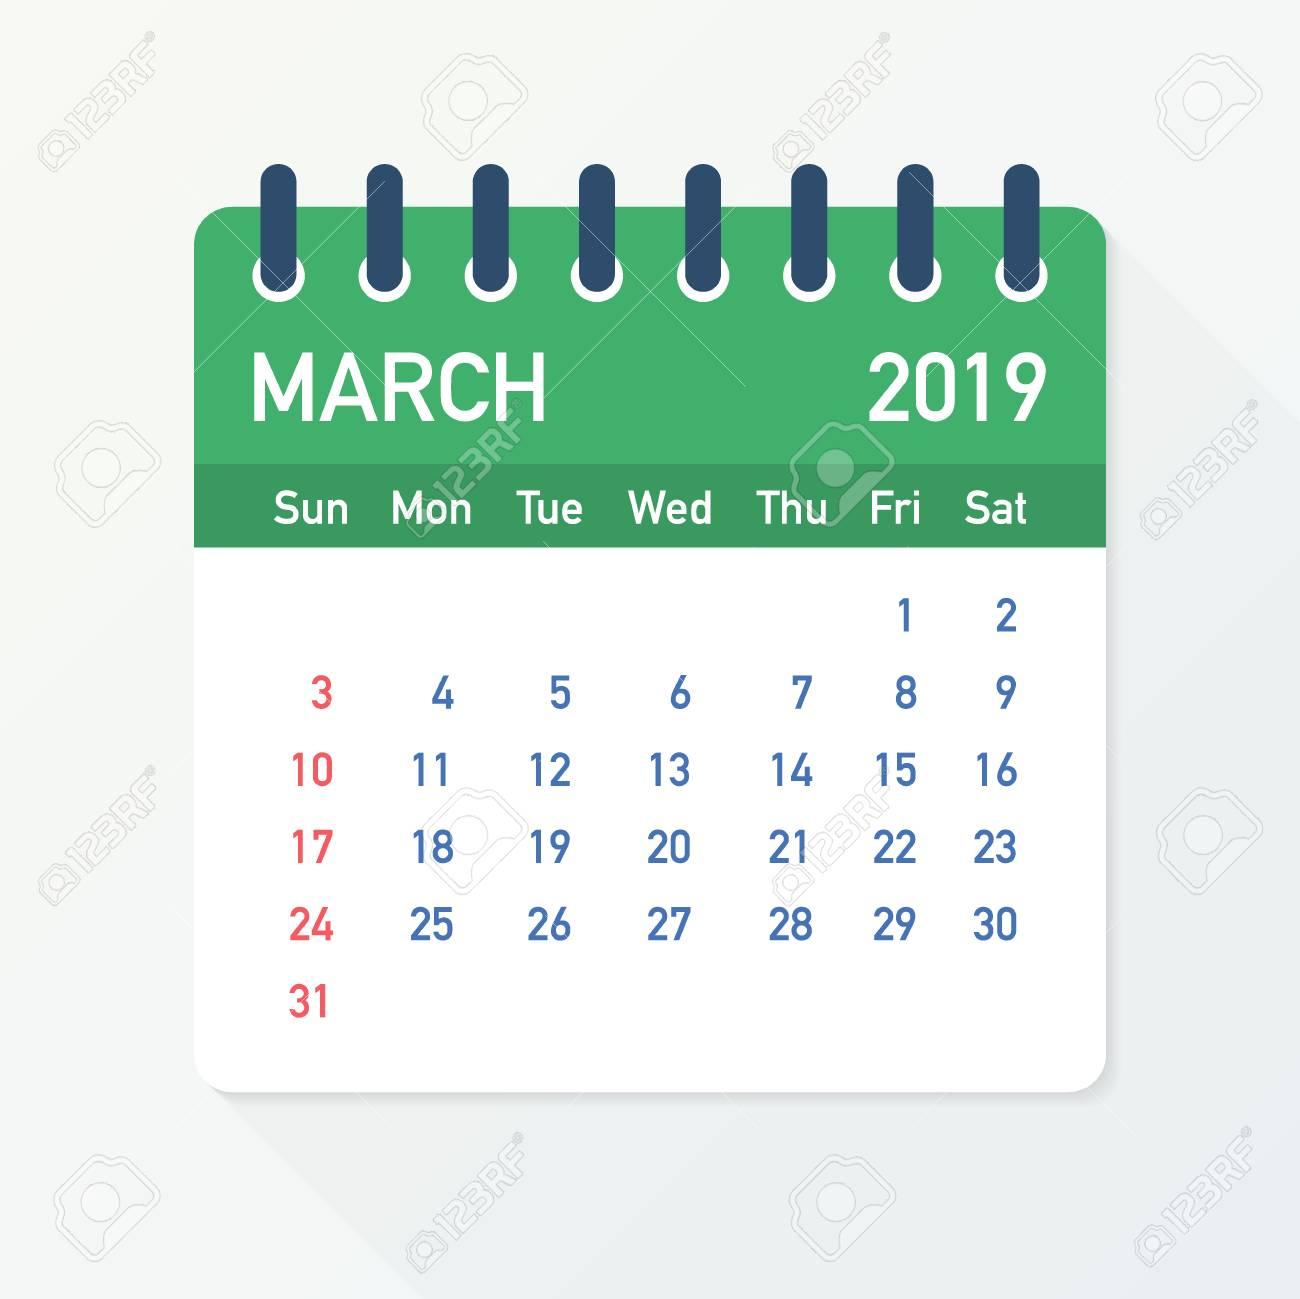 March 2019 Calendar Leaf  Calendar 2019 in flat style  Vector